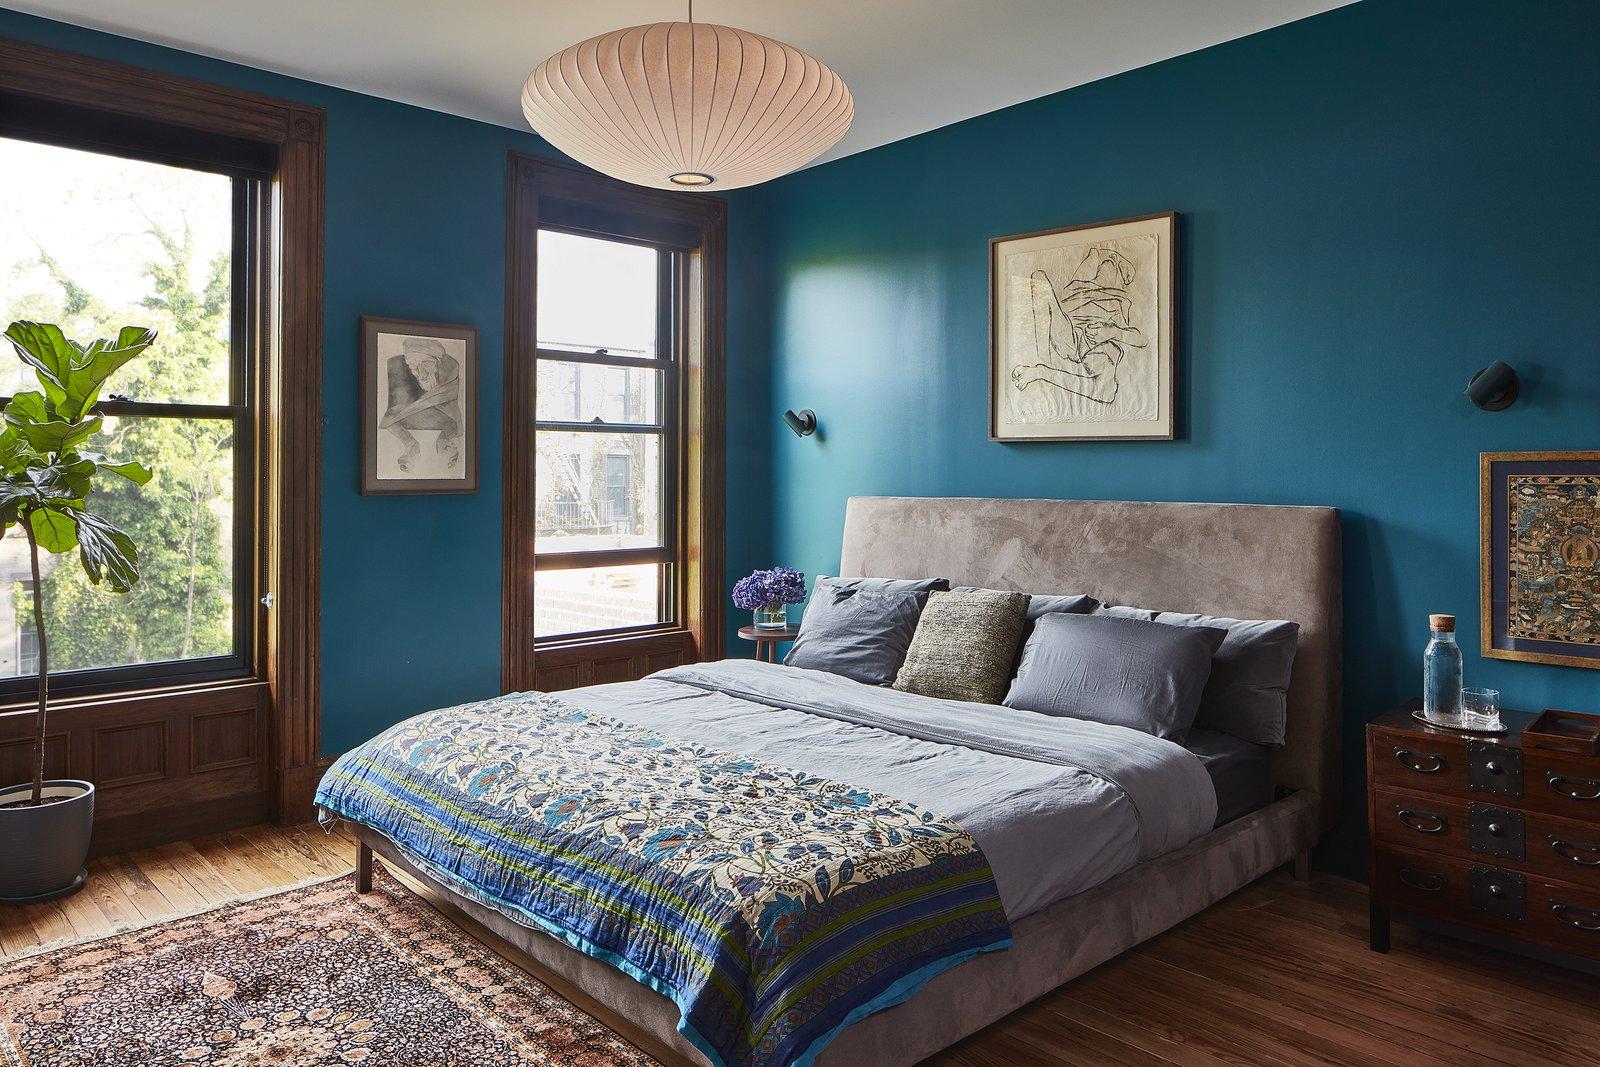 Bedroom, Dresser, Ceiling Lighting, Bed, Medium Hardwood Floor, Pendant Lighting, and Night Stands SECOND FLOOR - MASTER BEDROOM Photo © Ashok Sinha  Photos from Bed-Stuy Townhouse